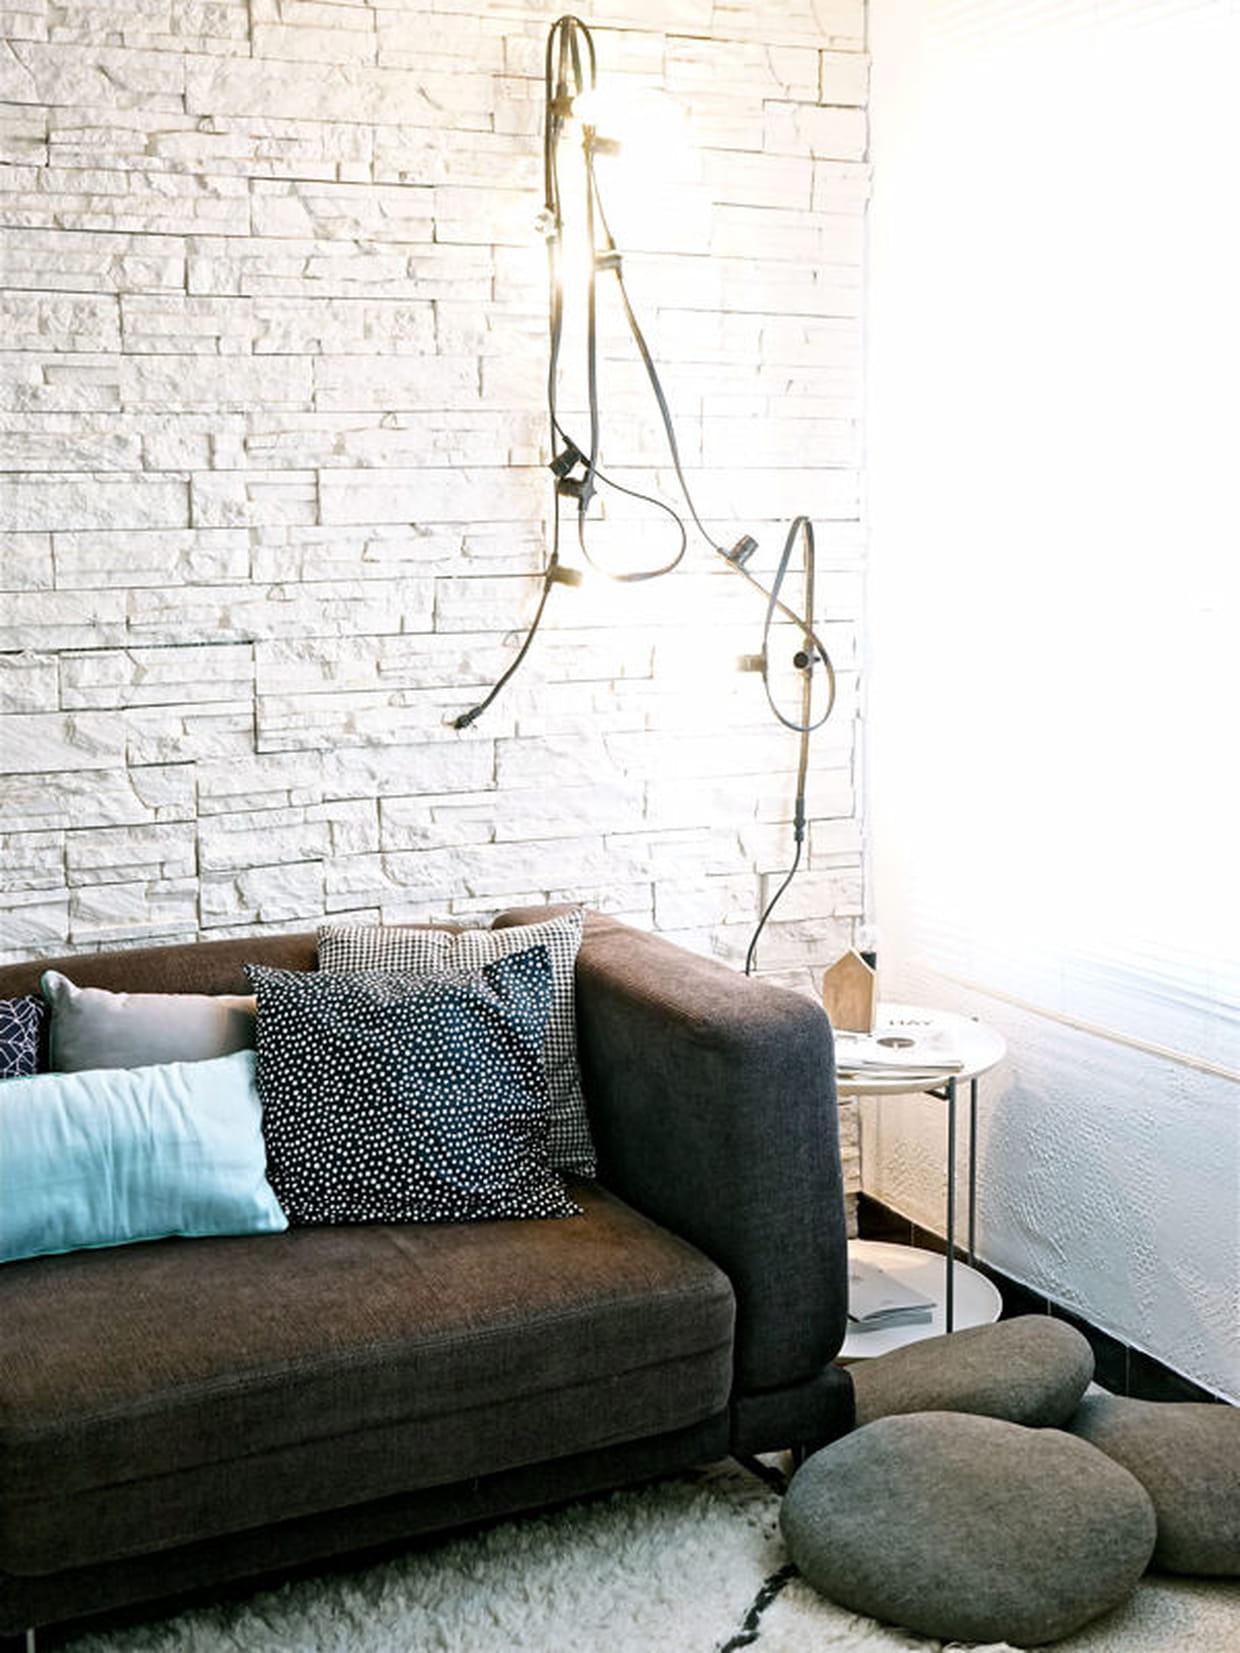 salon cosy et tendance. Black Bedroom Furniture Sets. Home Design Ideas